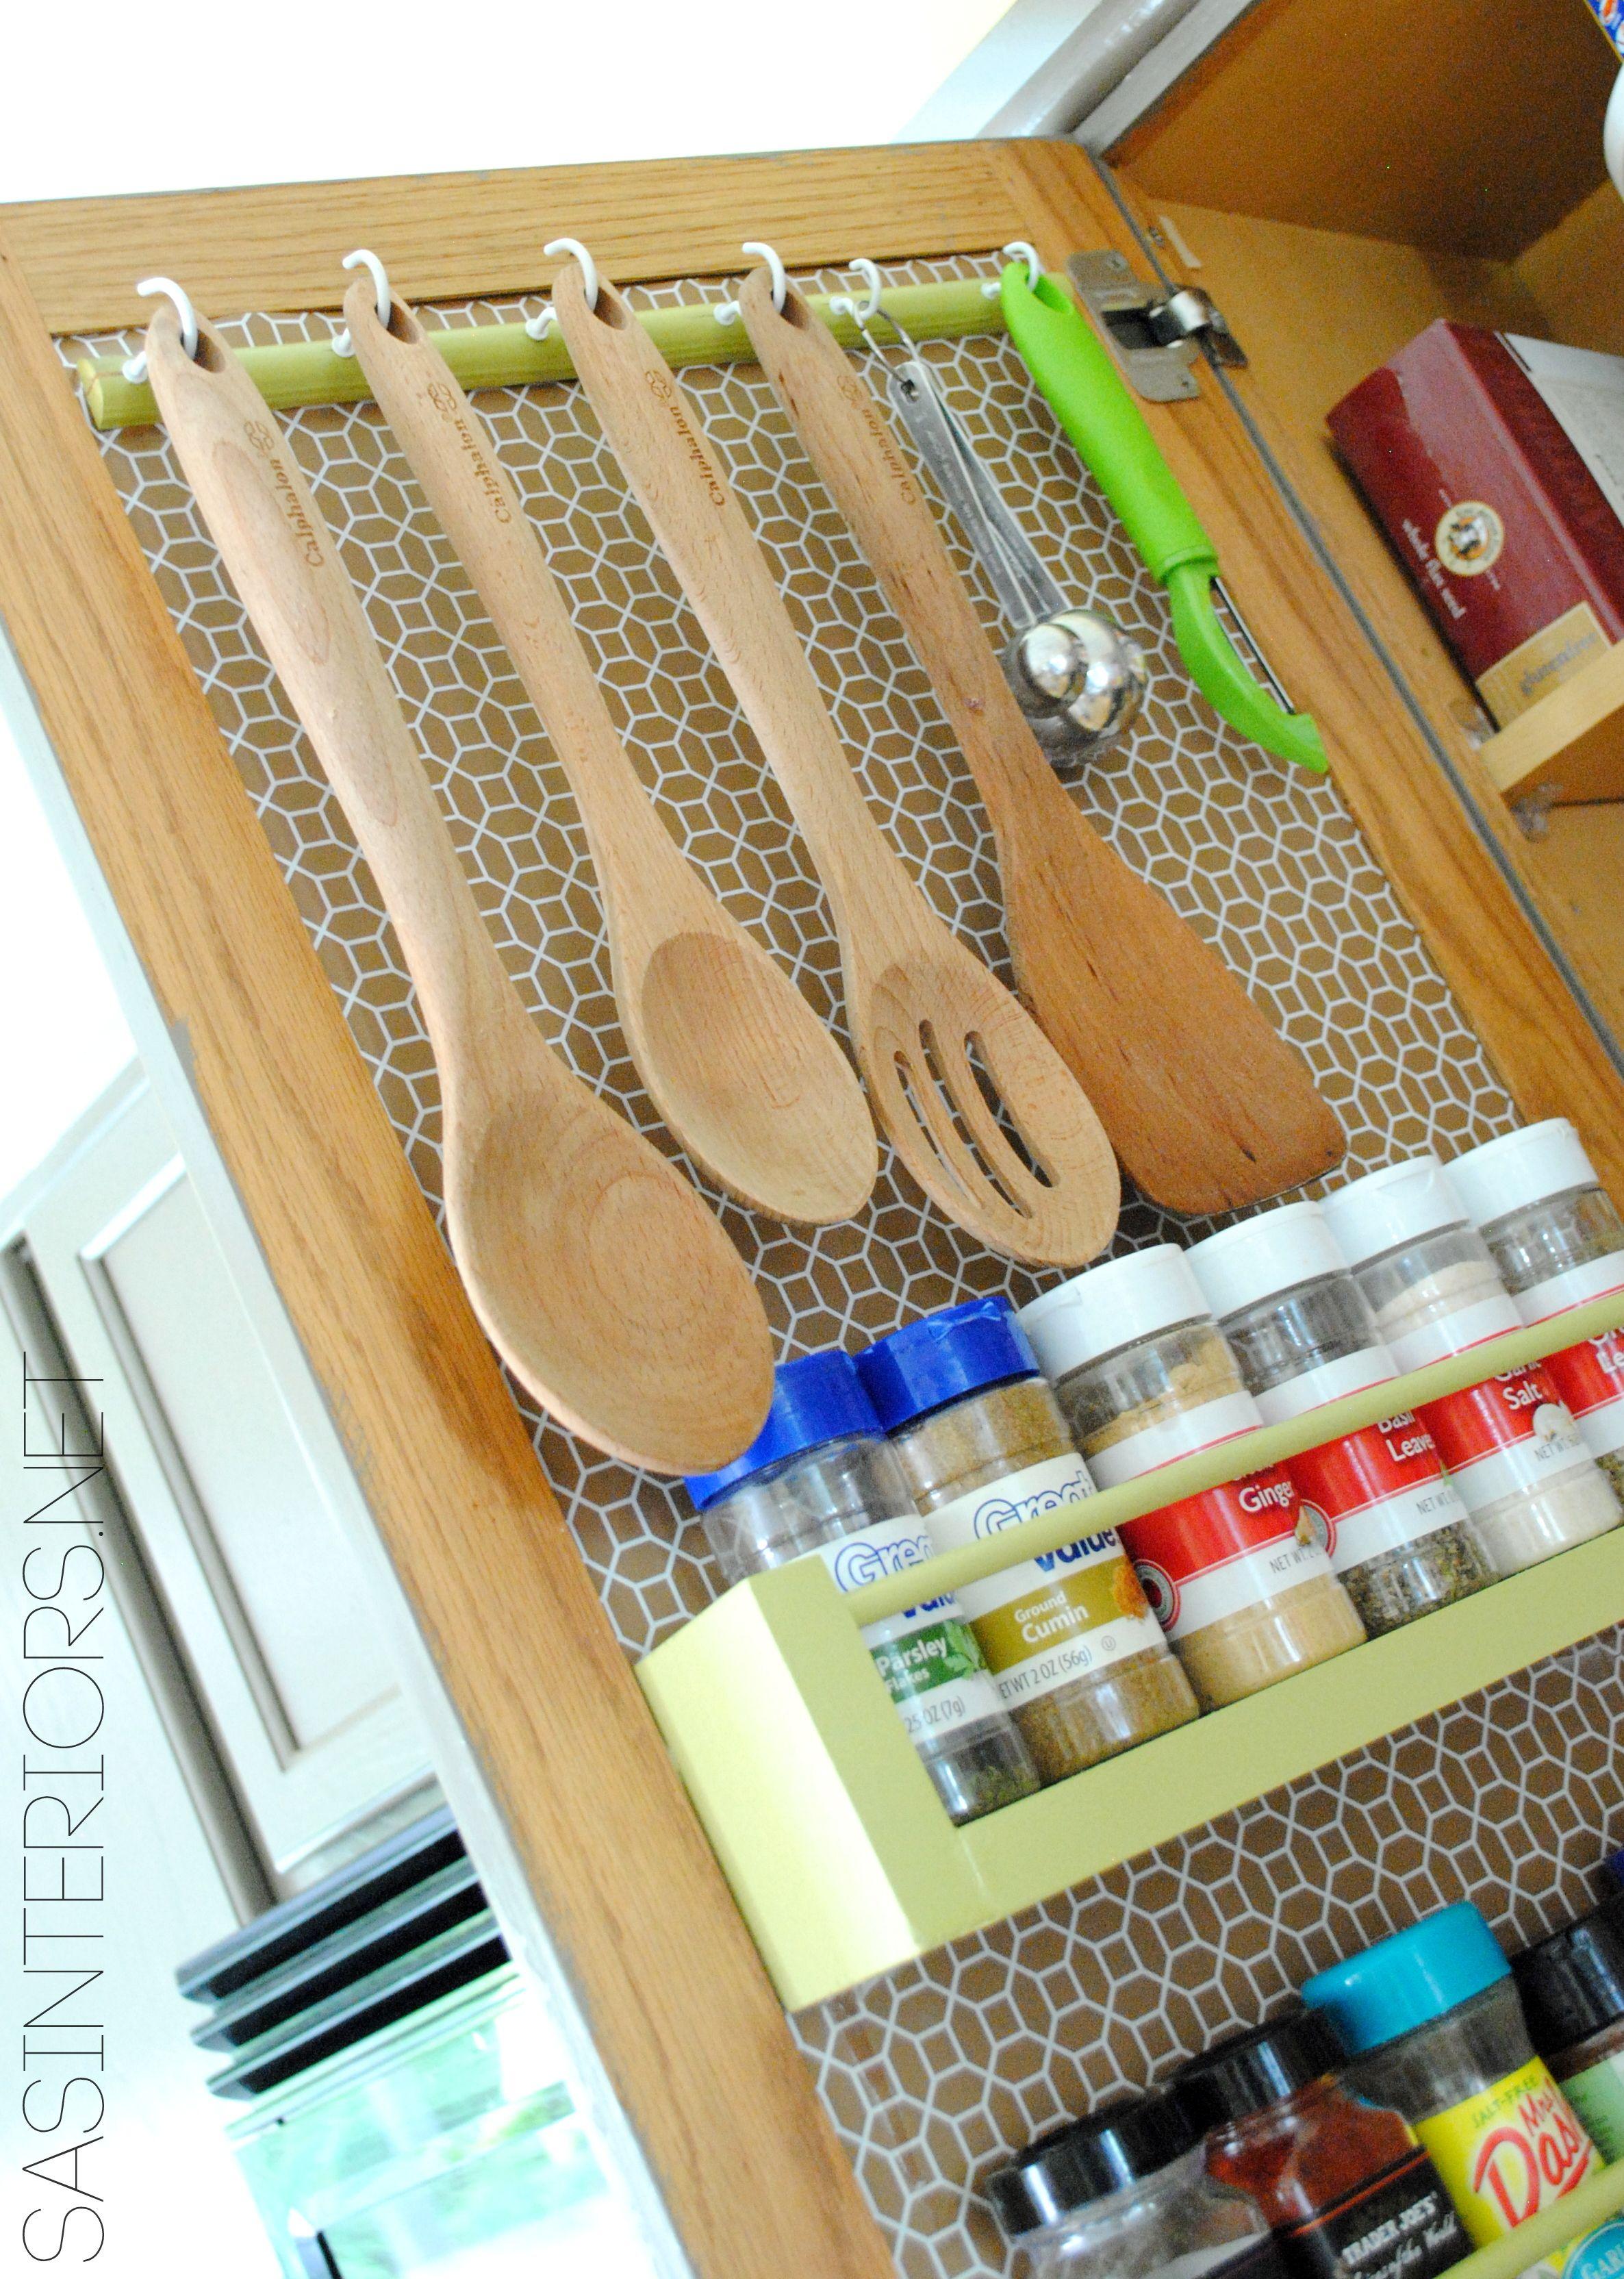 Küchenideen kmart kitchen organization ideas for the inside of the cabinet doors